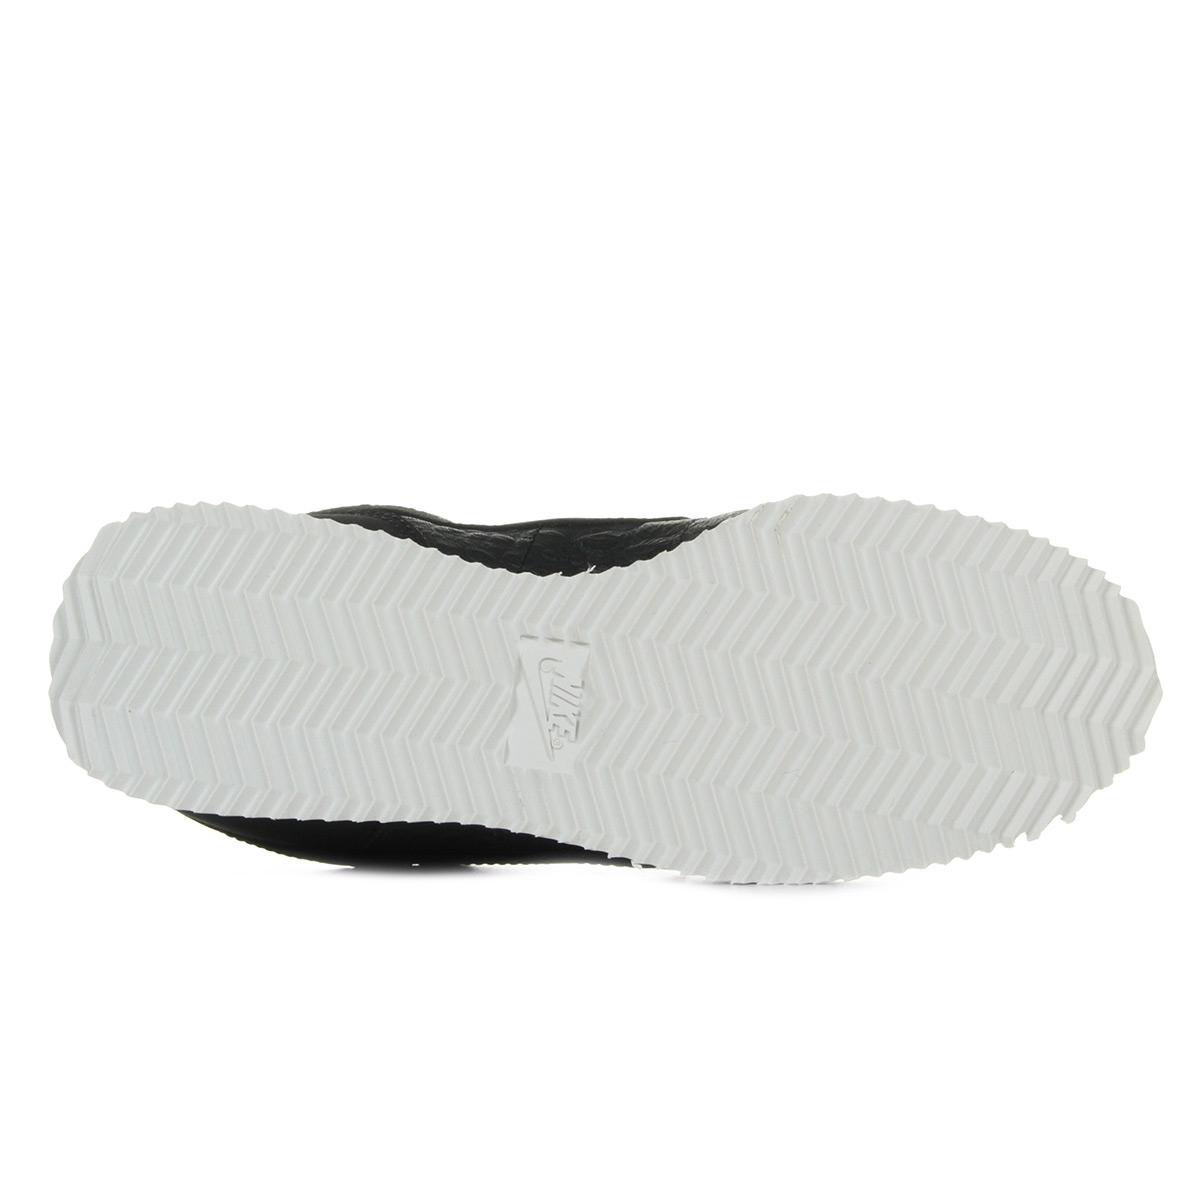 Nike Cortez Classic Ltr Se Gs AA3043001, Baskets mode femme